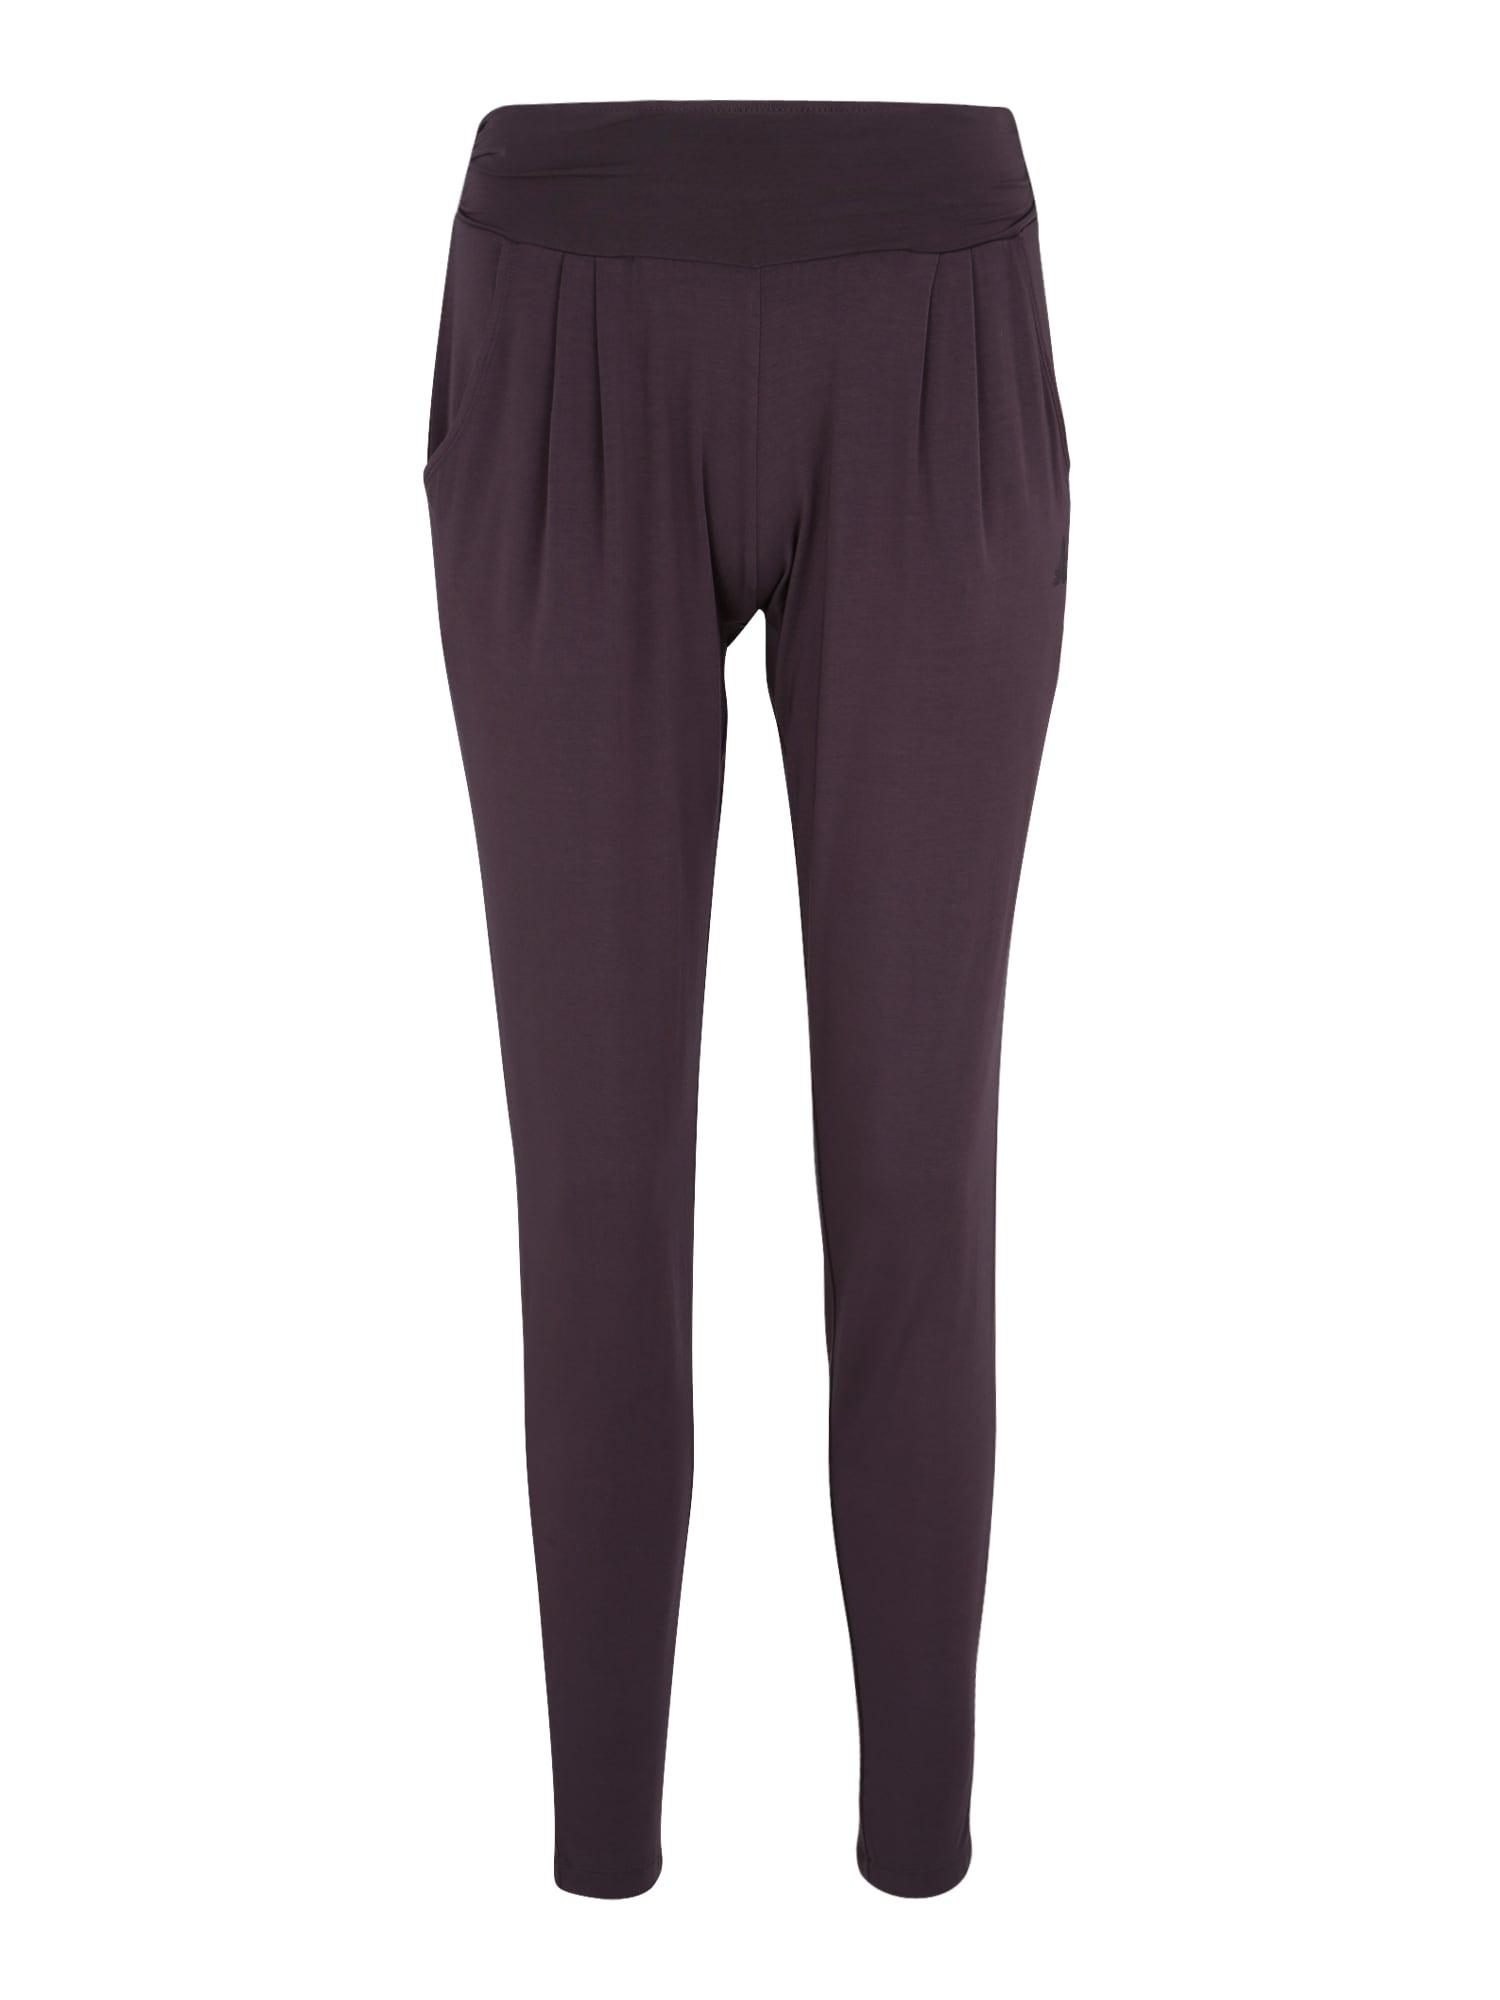 Sportovní kalhoty lilek CURARE Yogawear